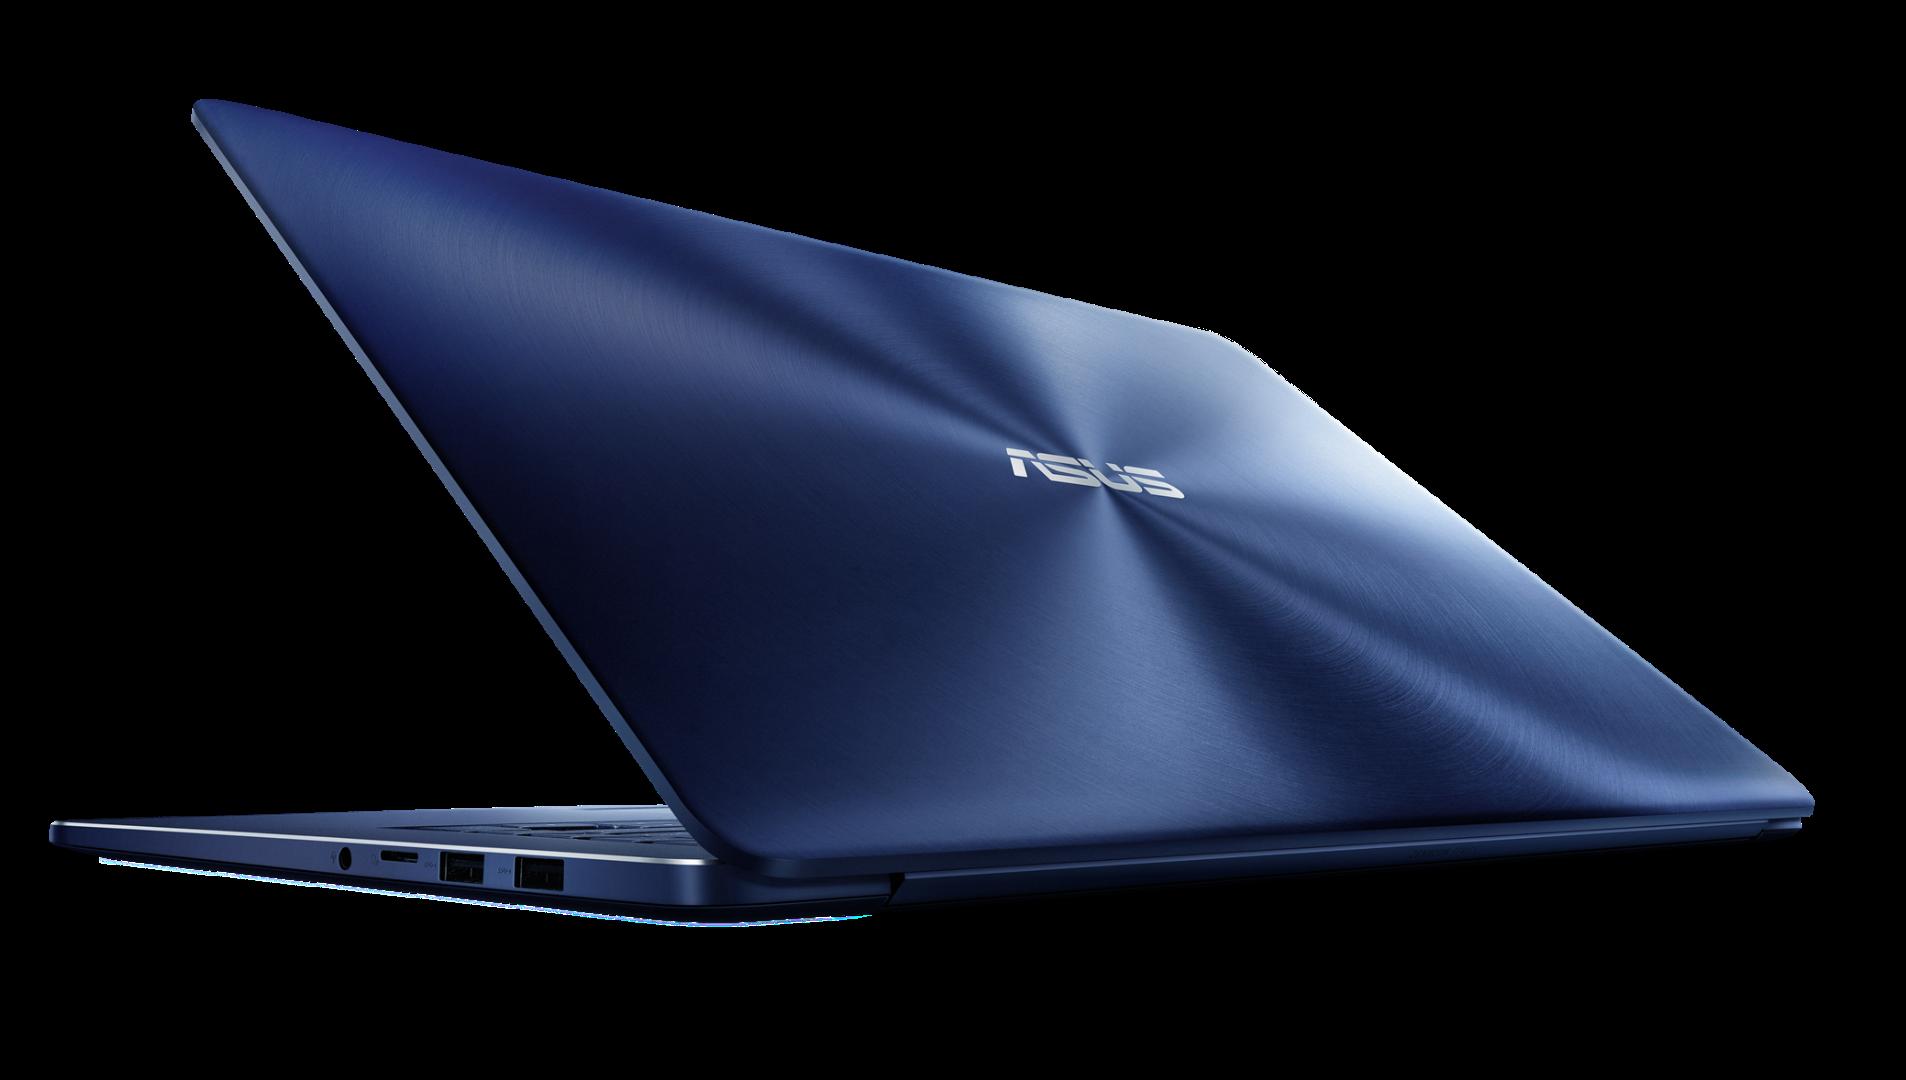 ASUS ZenBook Pro UX550, tutti i dettagli tecnici